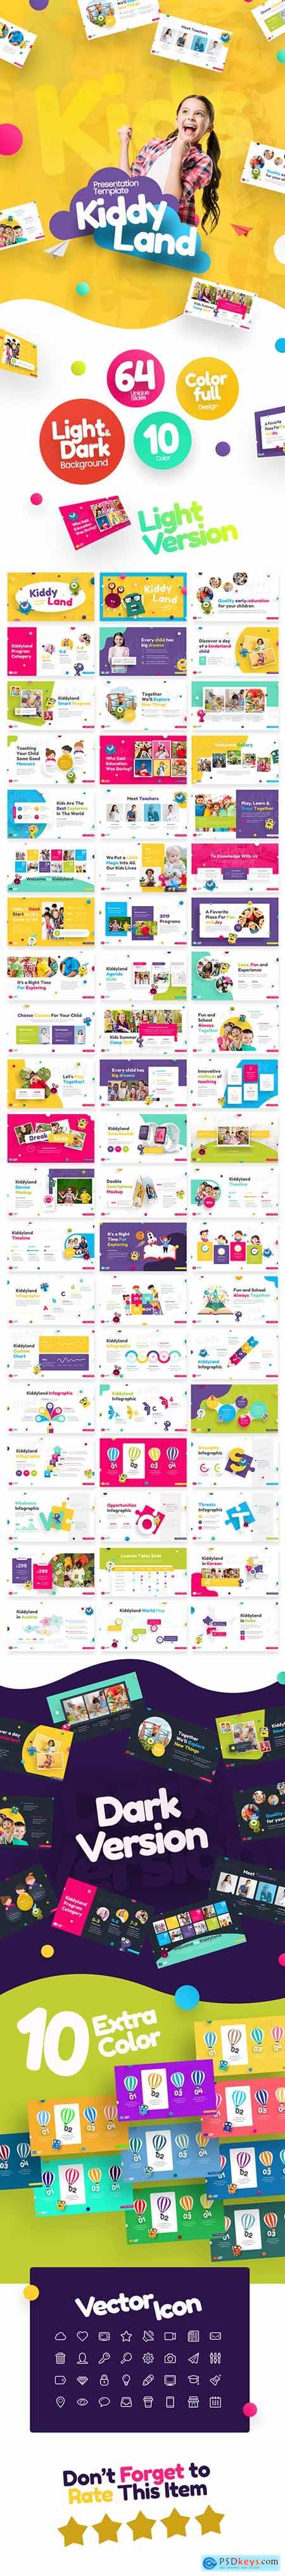 Kiddyland Fun Education PowerPoint Presentation Template 24663871